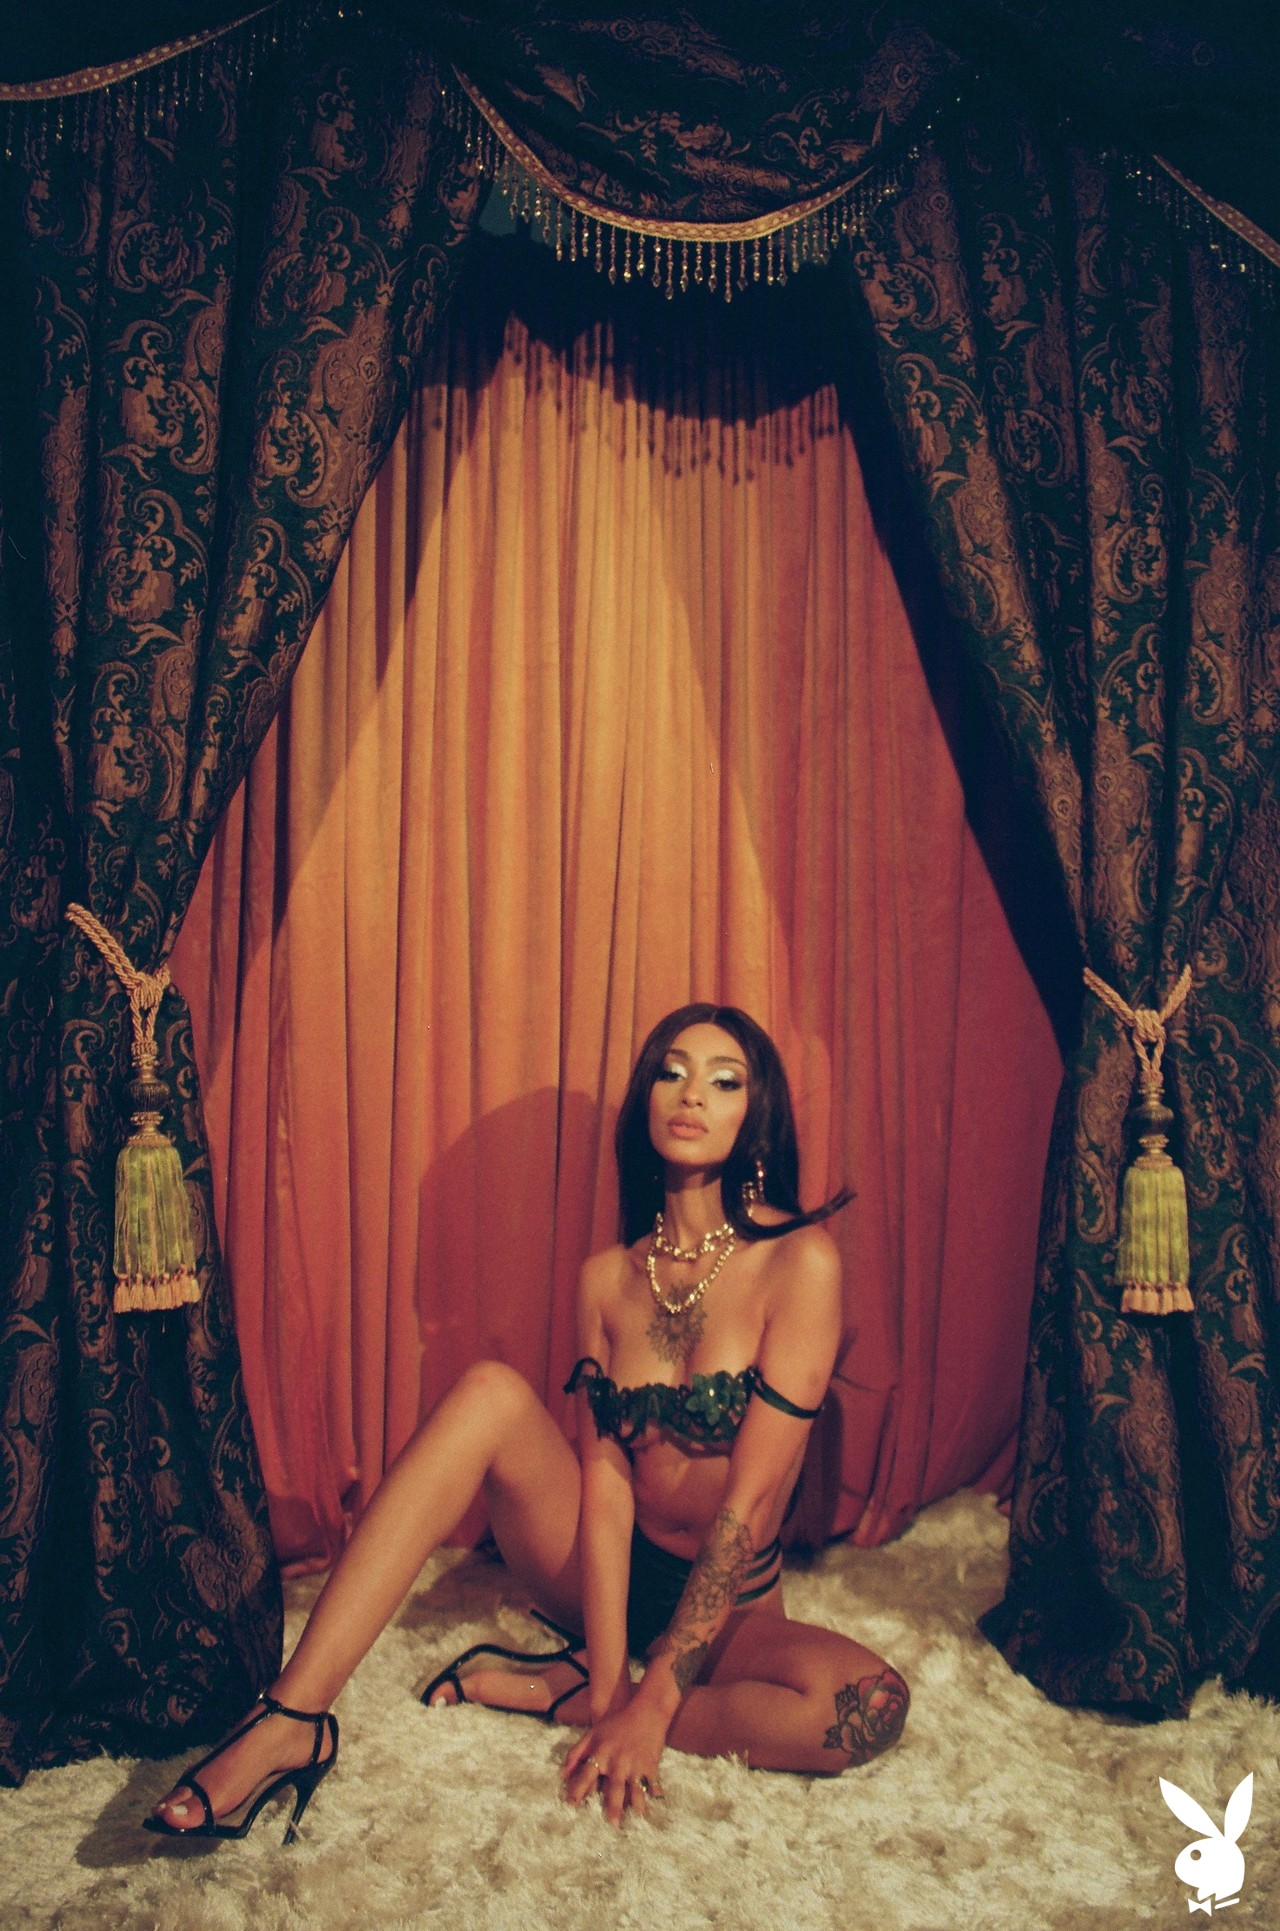 Sunni In Performance Art Playboy Plus (7)